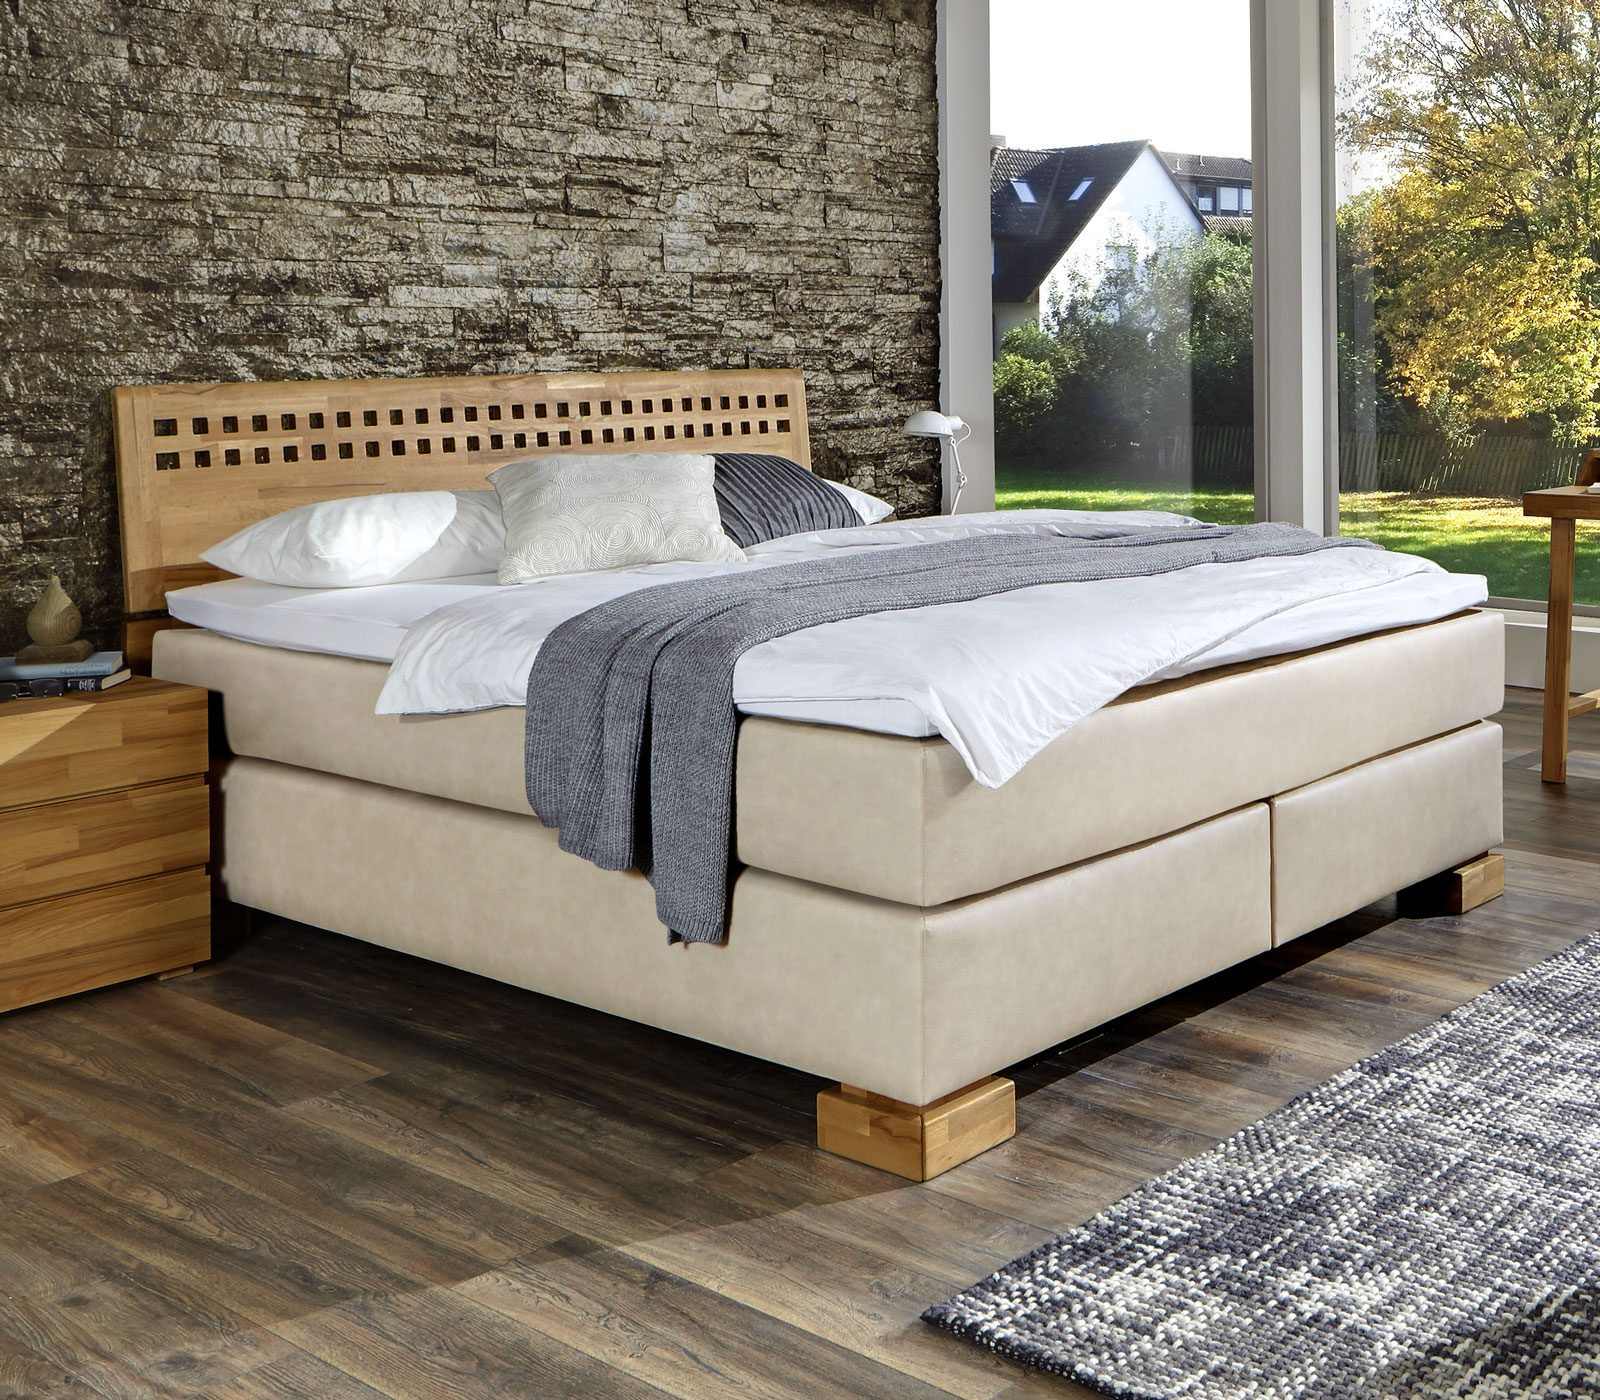 boxspringbett im h rtegrad h2 oder h3 paterno. Black Bedroom Furniture Sets. Home Design Ideas